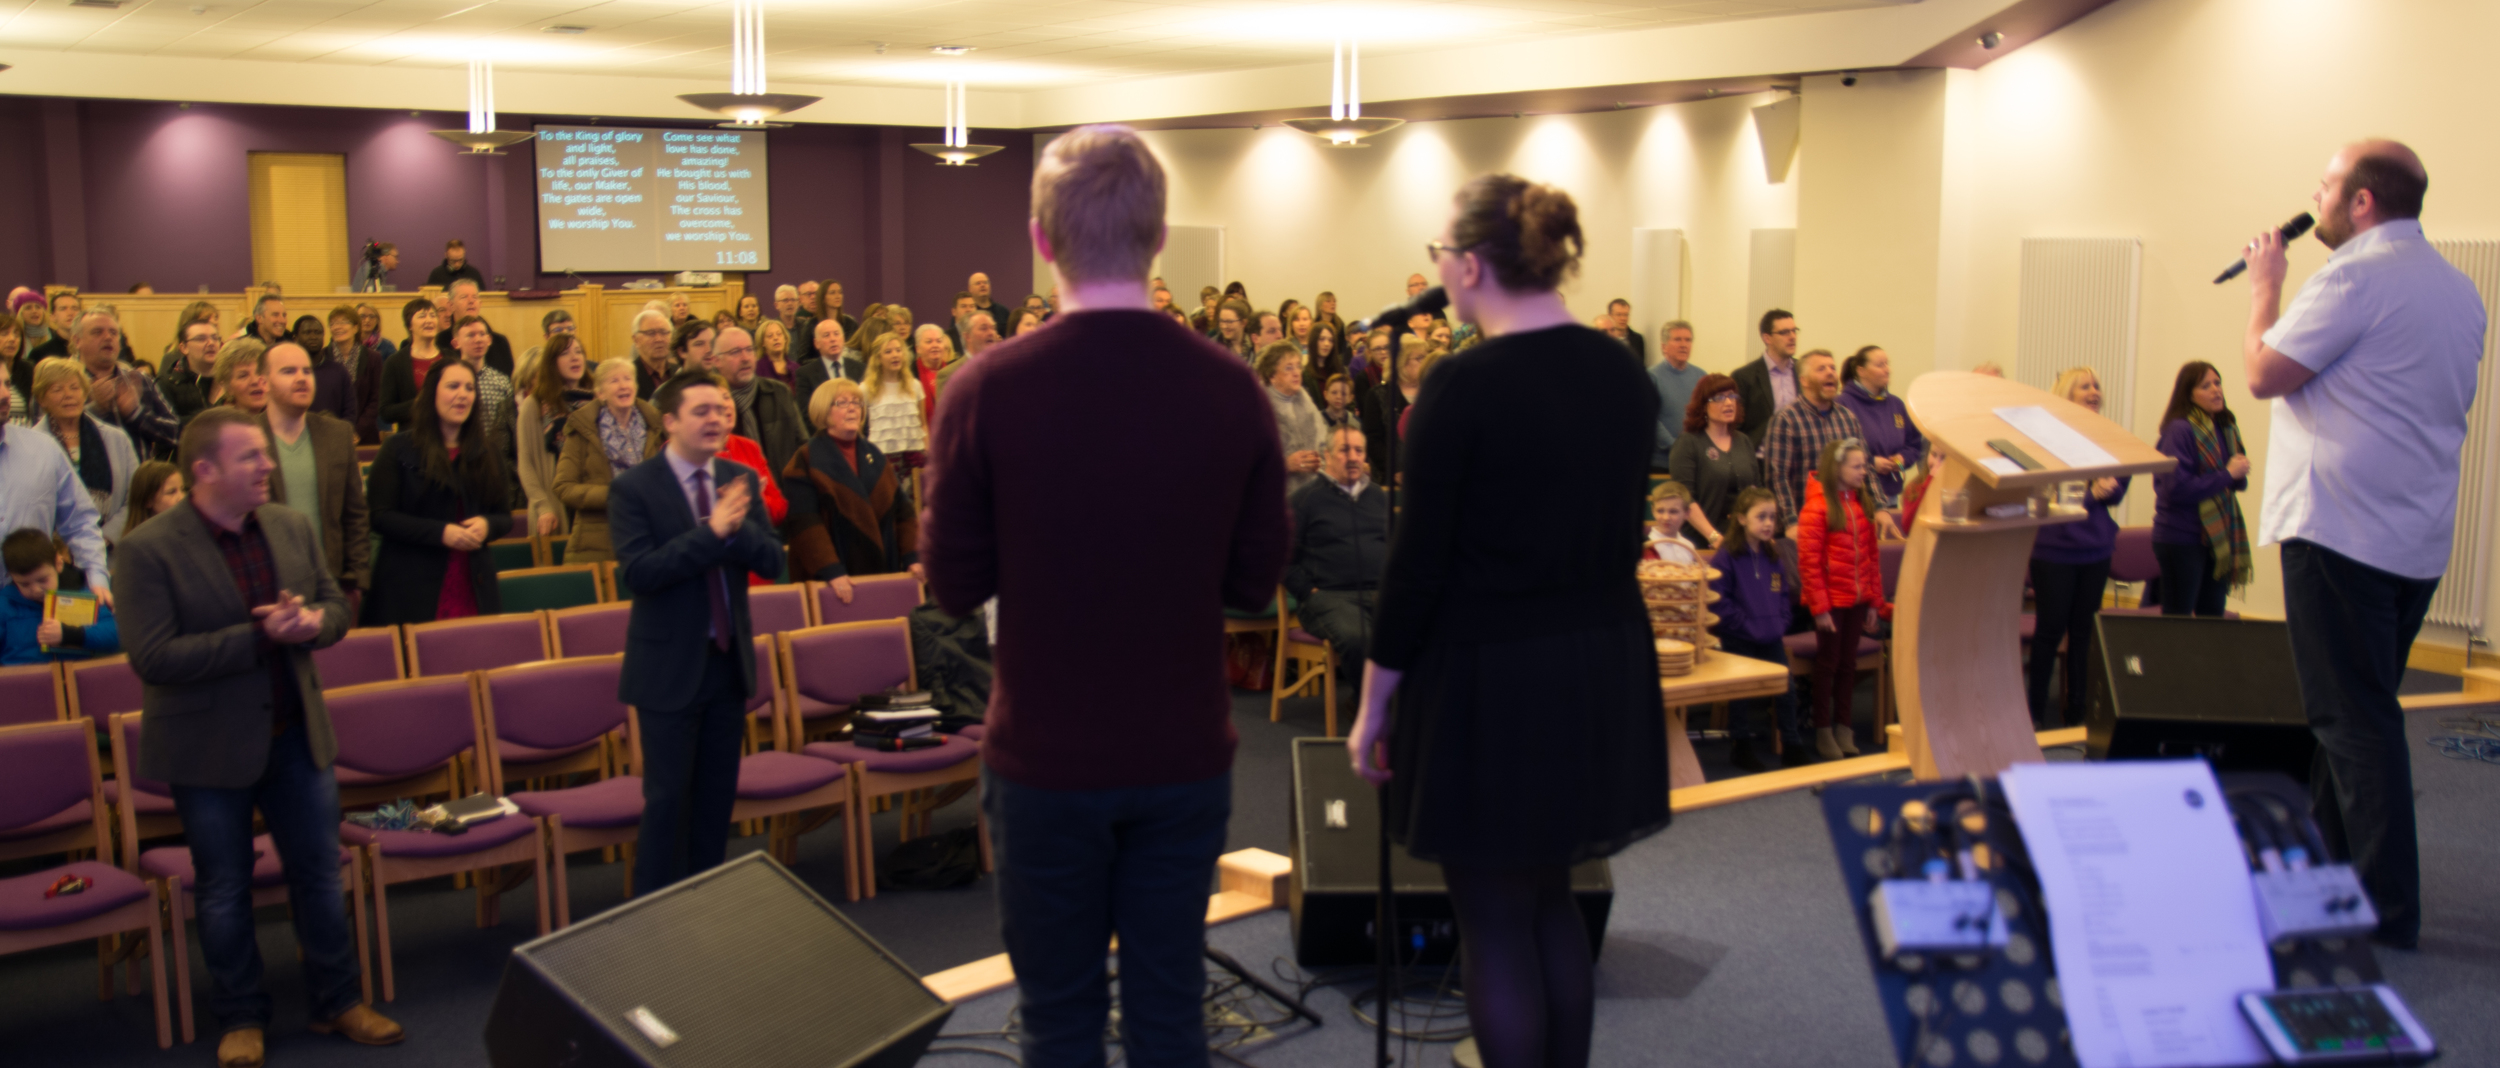 Hope Church 2016 (6 of 42).jpg